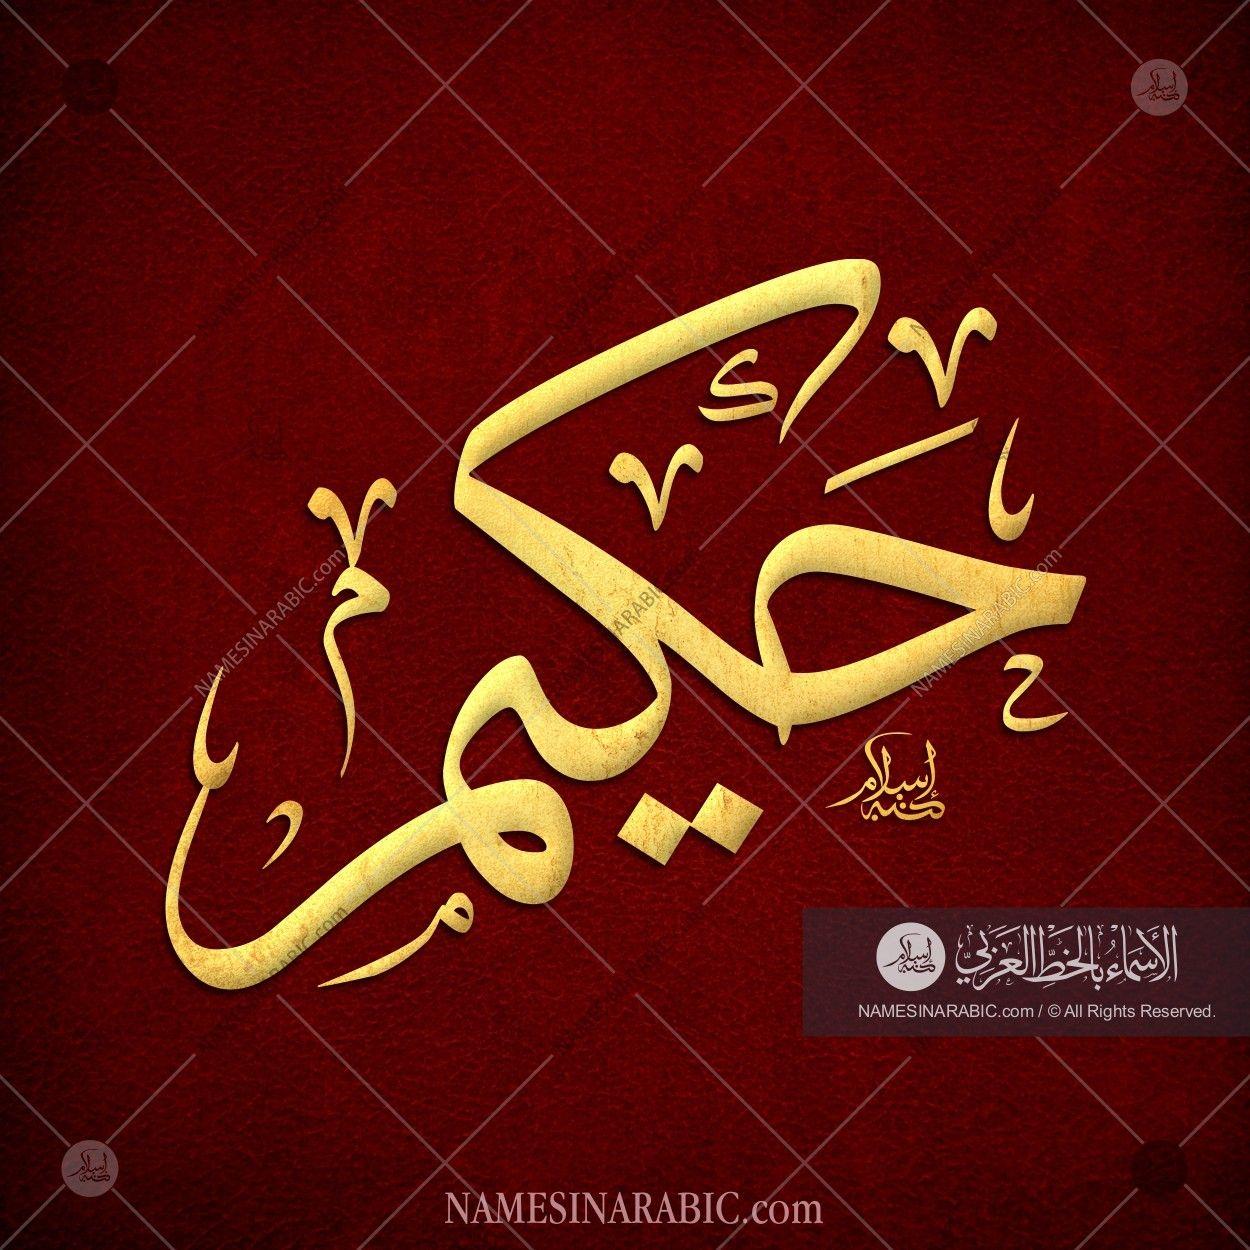 Hakim حكيم Names In Arabic Calligraphy Name 3991 Calligraphy Name Calligraphy Islamic Art Calligraphy